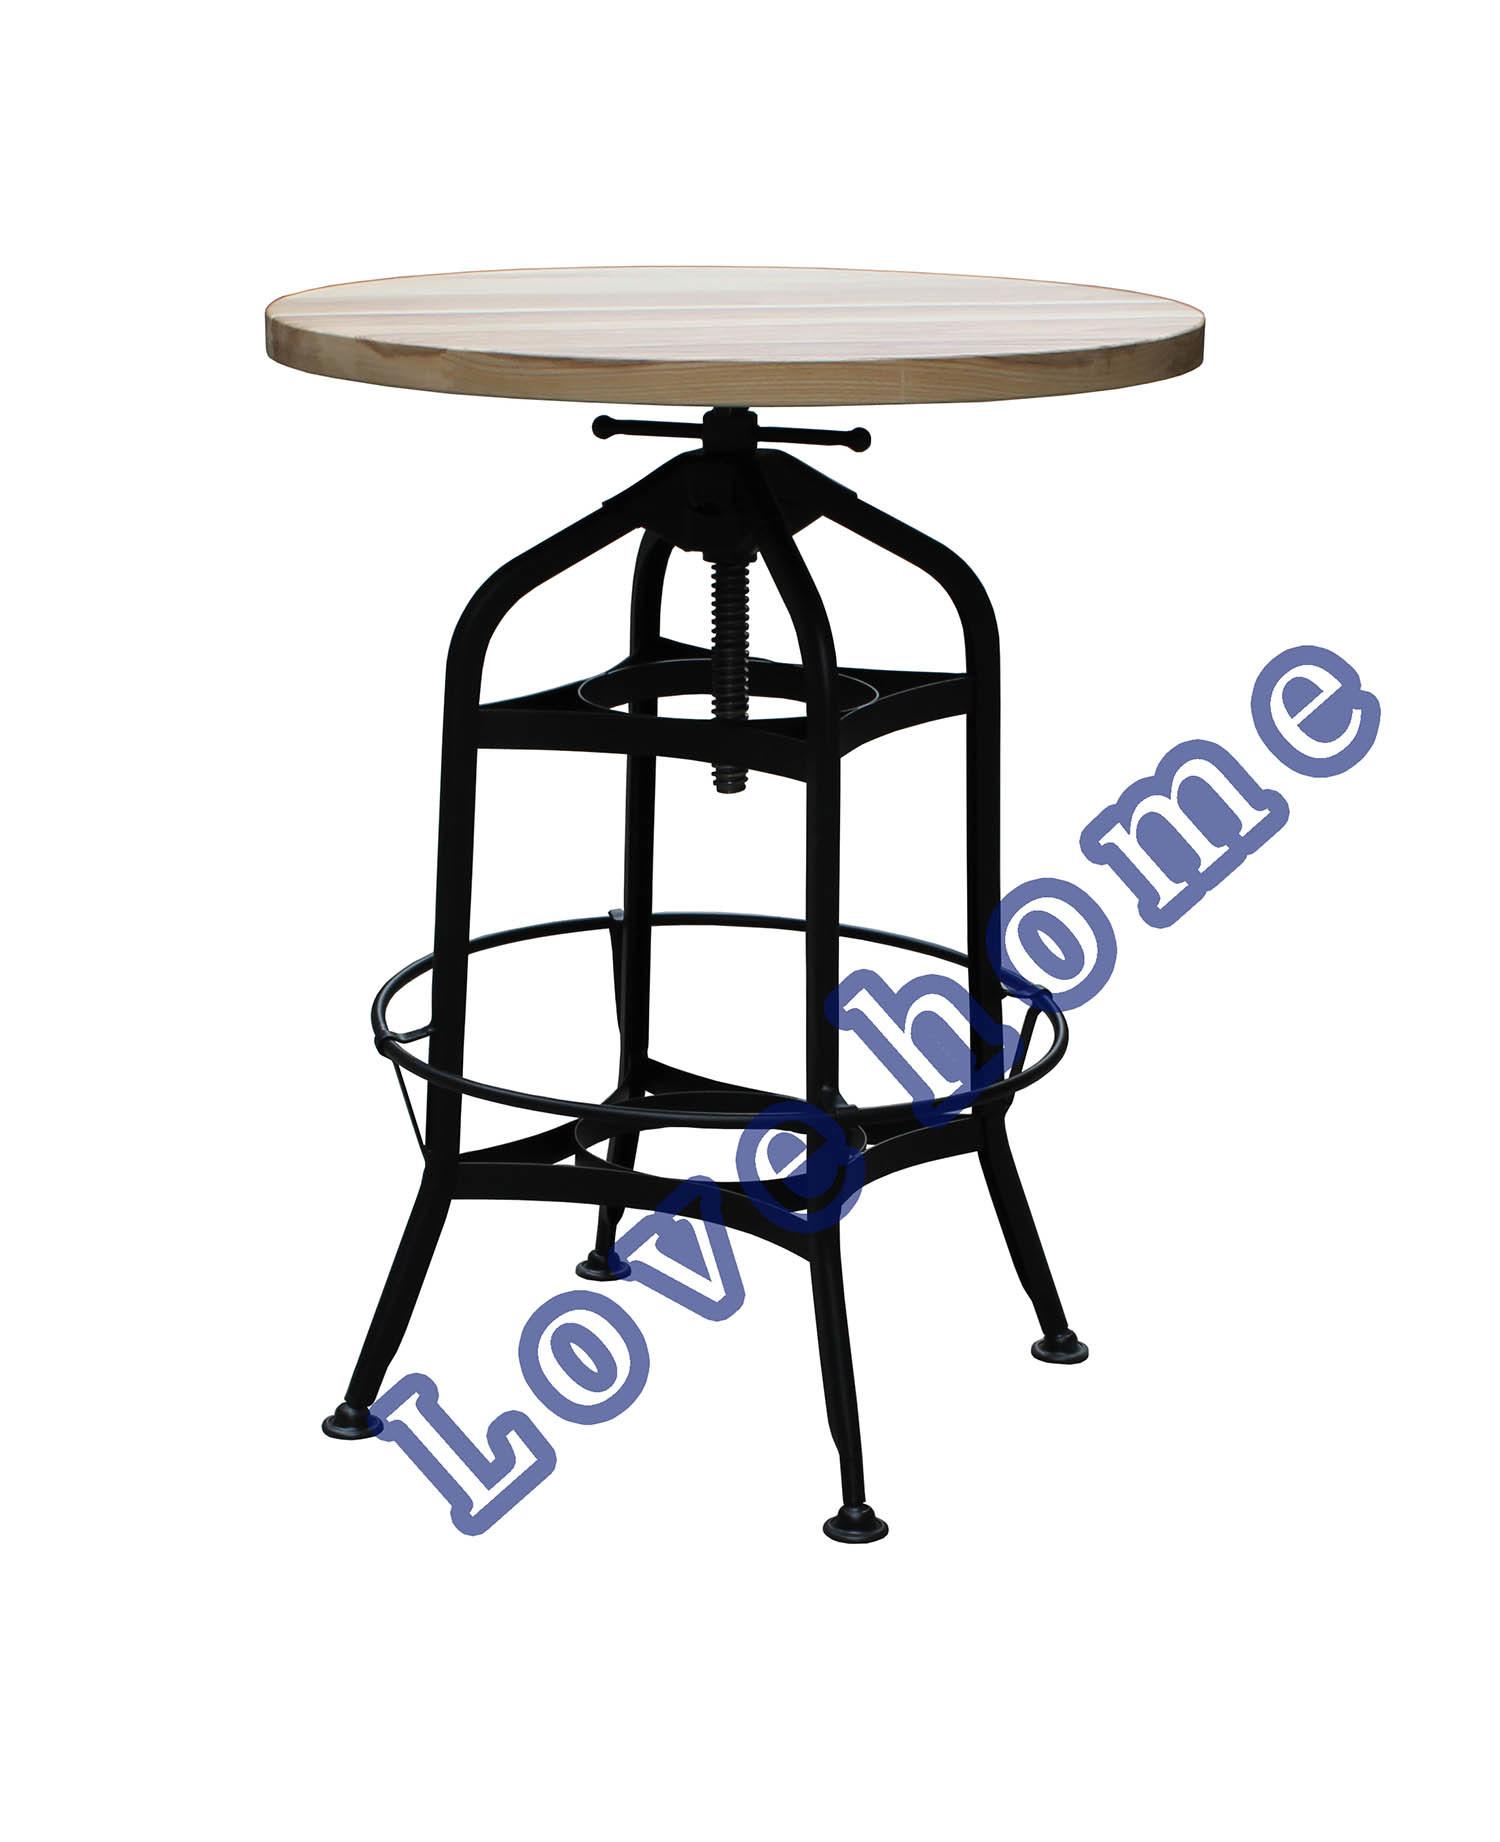 Industrial Metal Restaurant Wooden Turner Vintage Toledo Swivel Bar Table